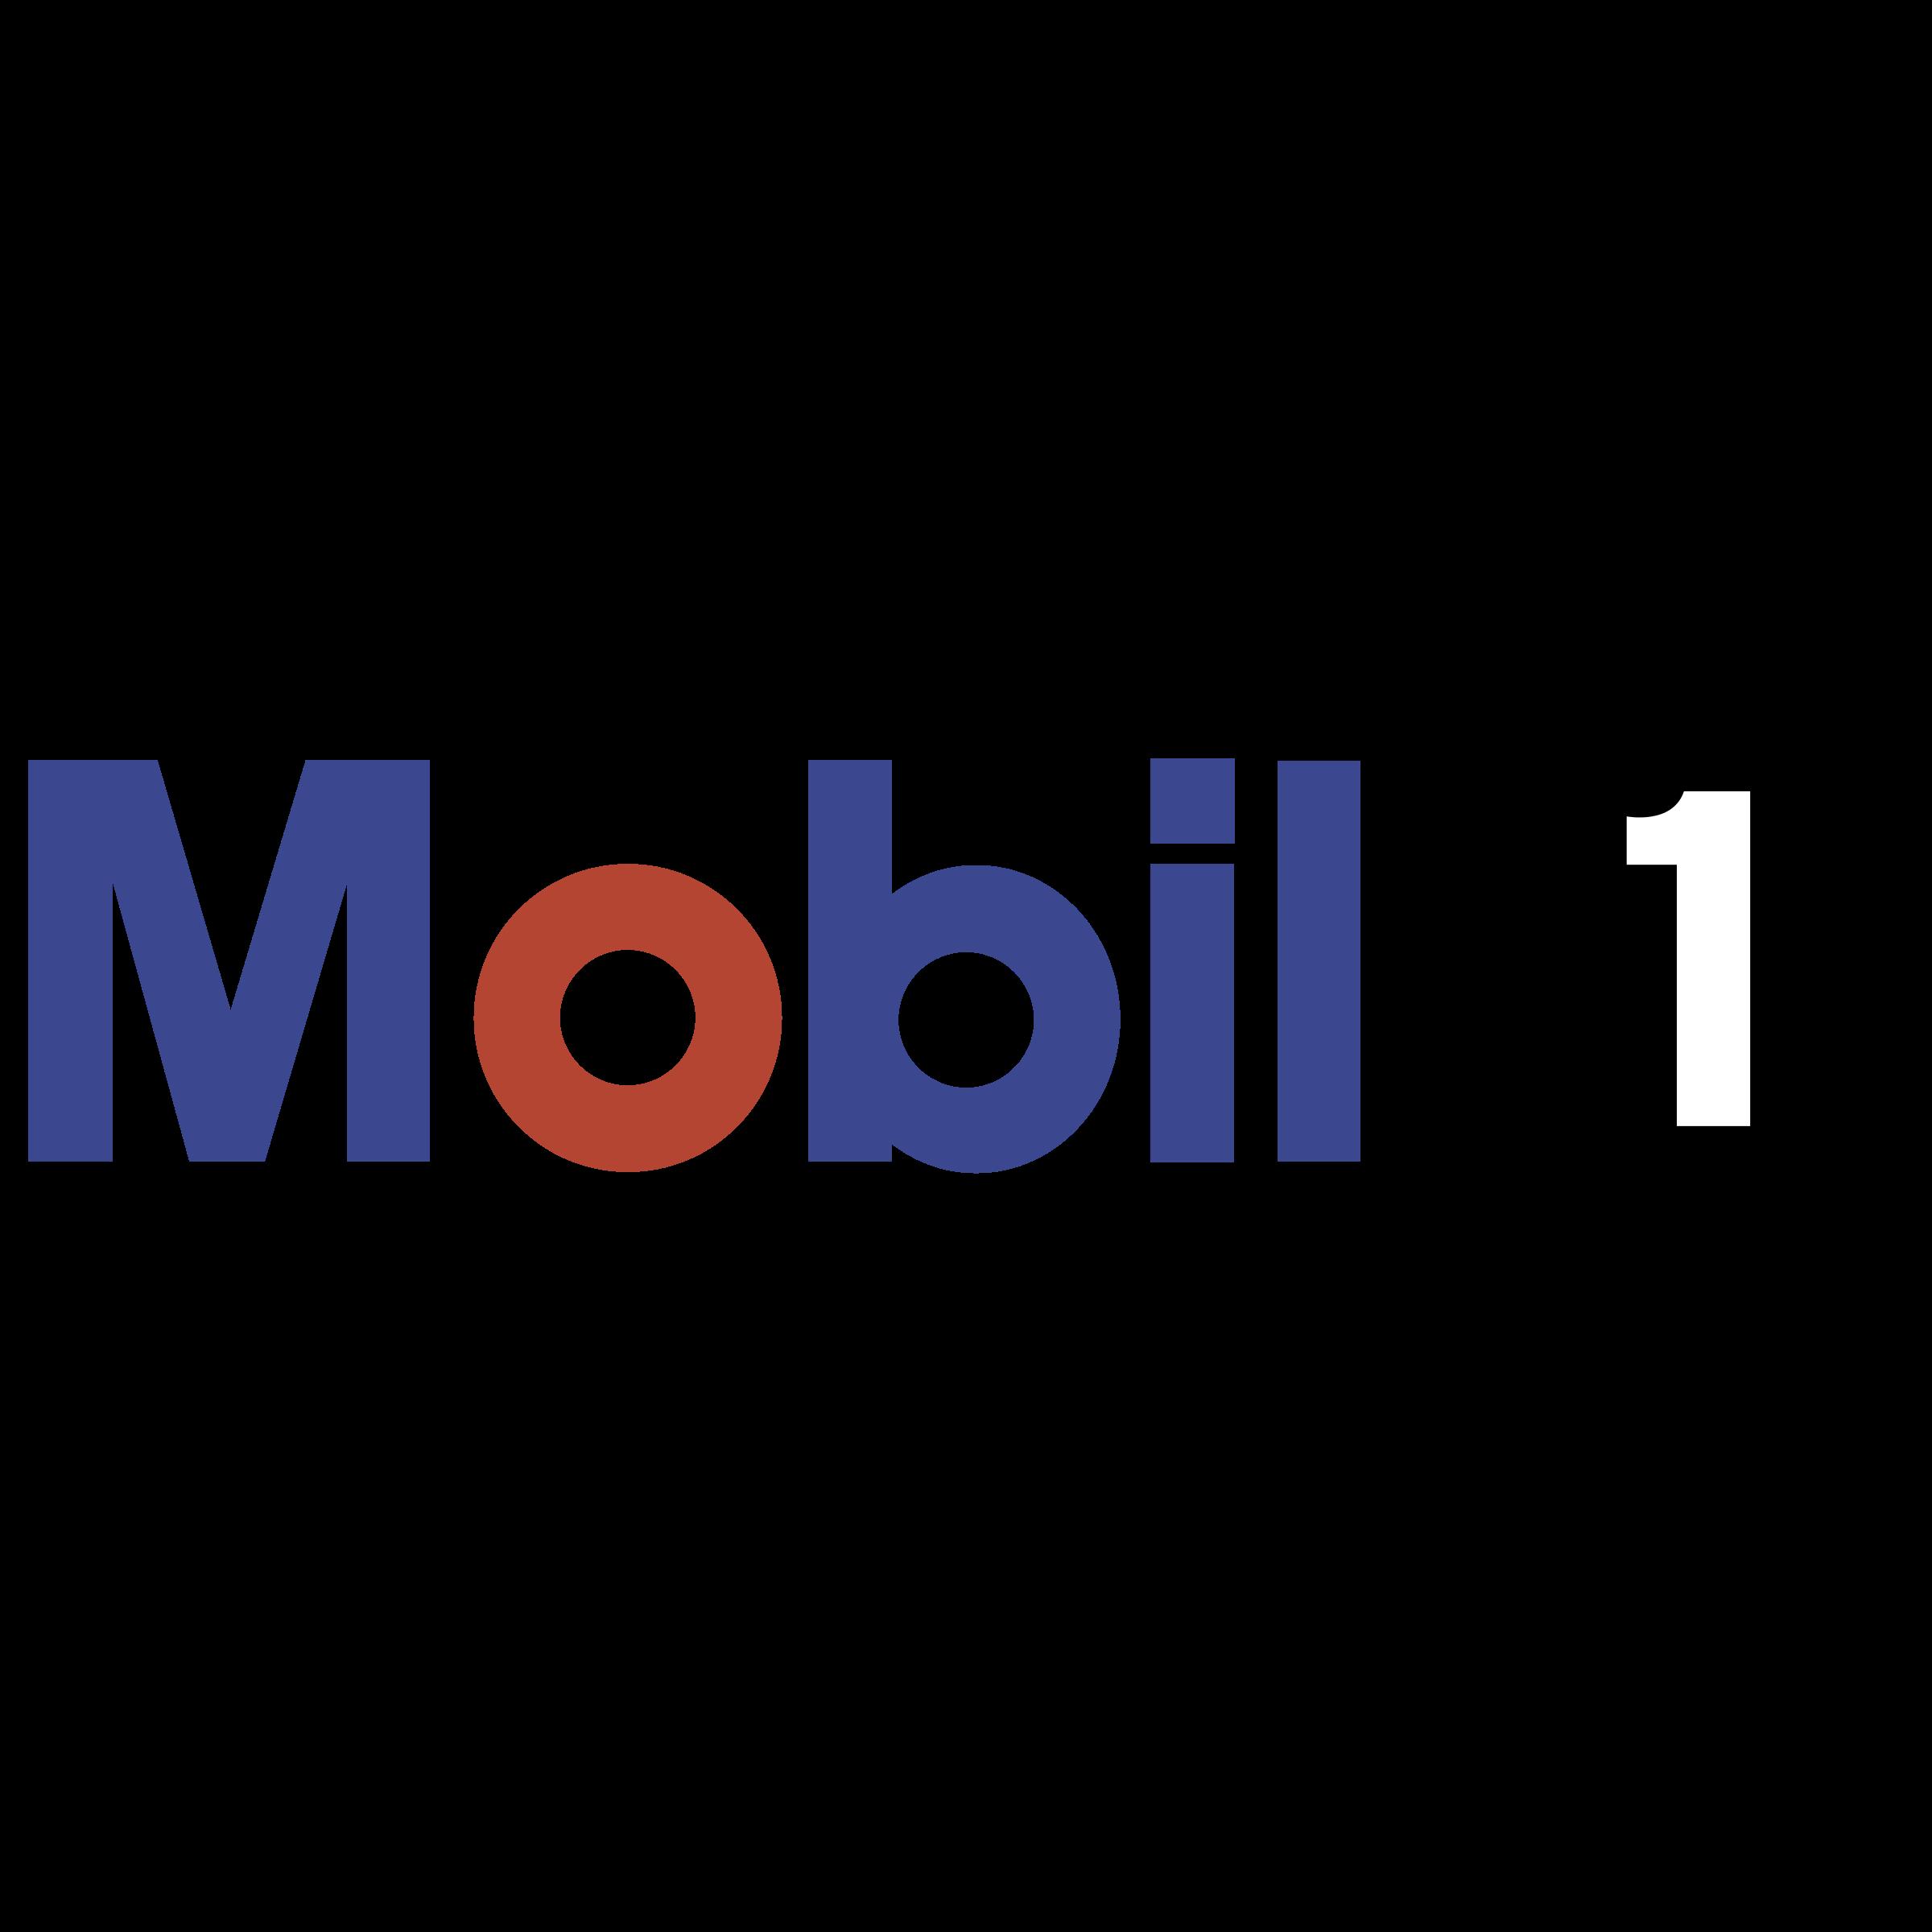 mobil 1 logo png transparent  u0026 svg vector